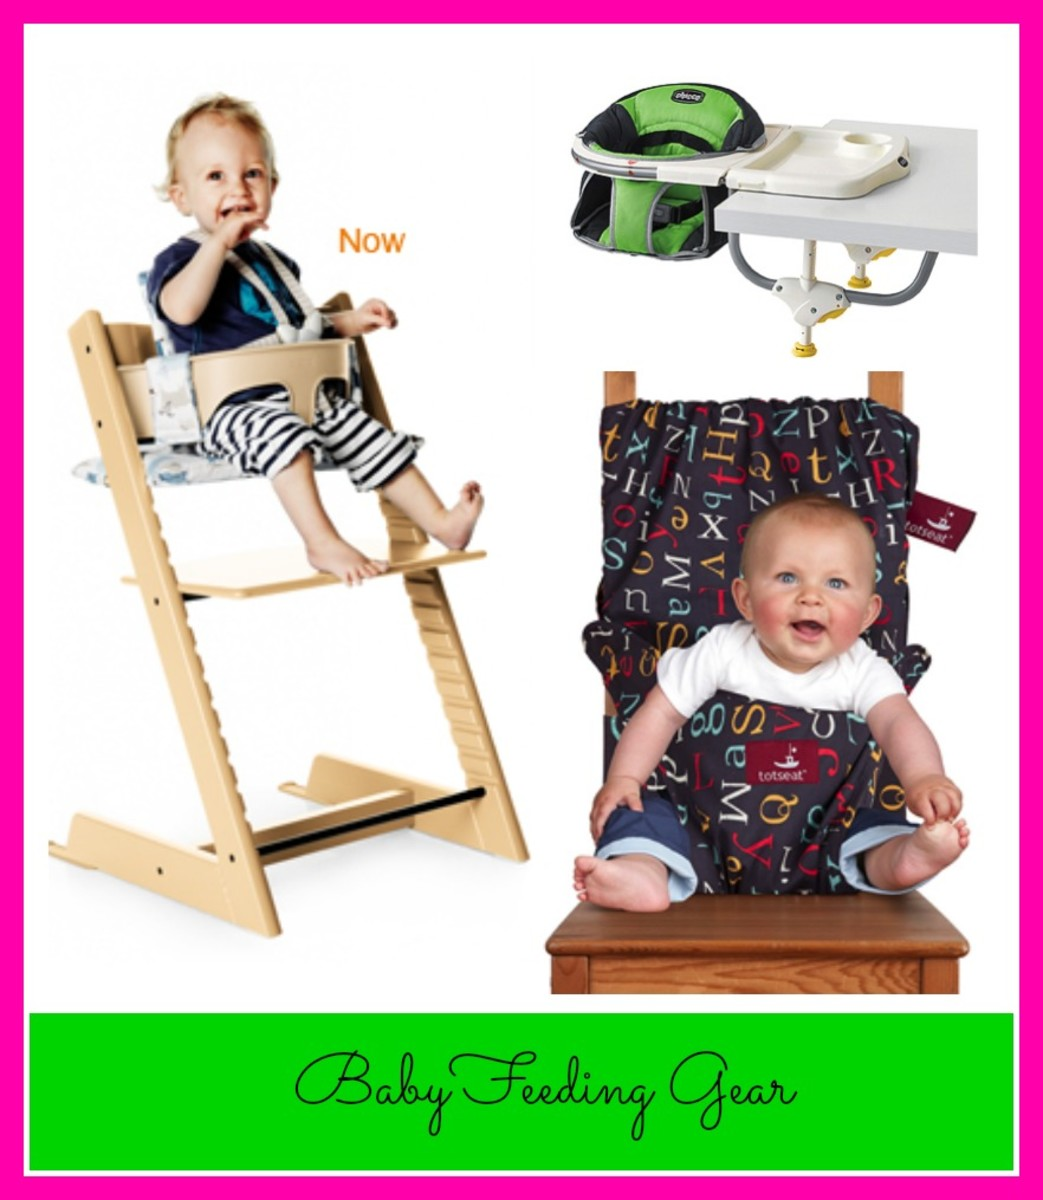 stokke tripp trapp, svan tot seat, chicco rotating 360 hook on chair, mealtime, feeding baby